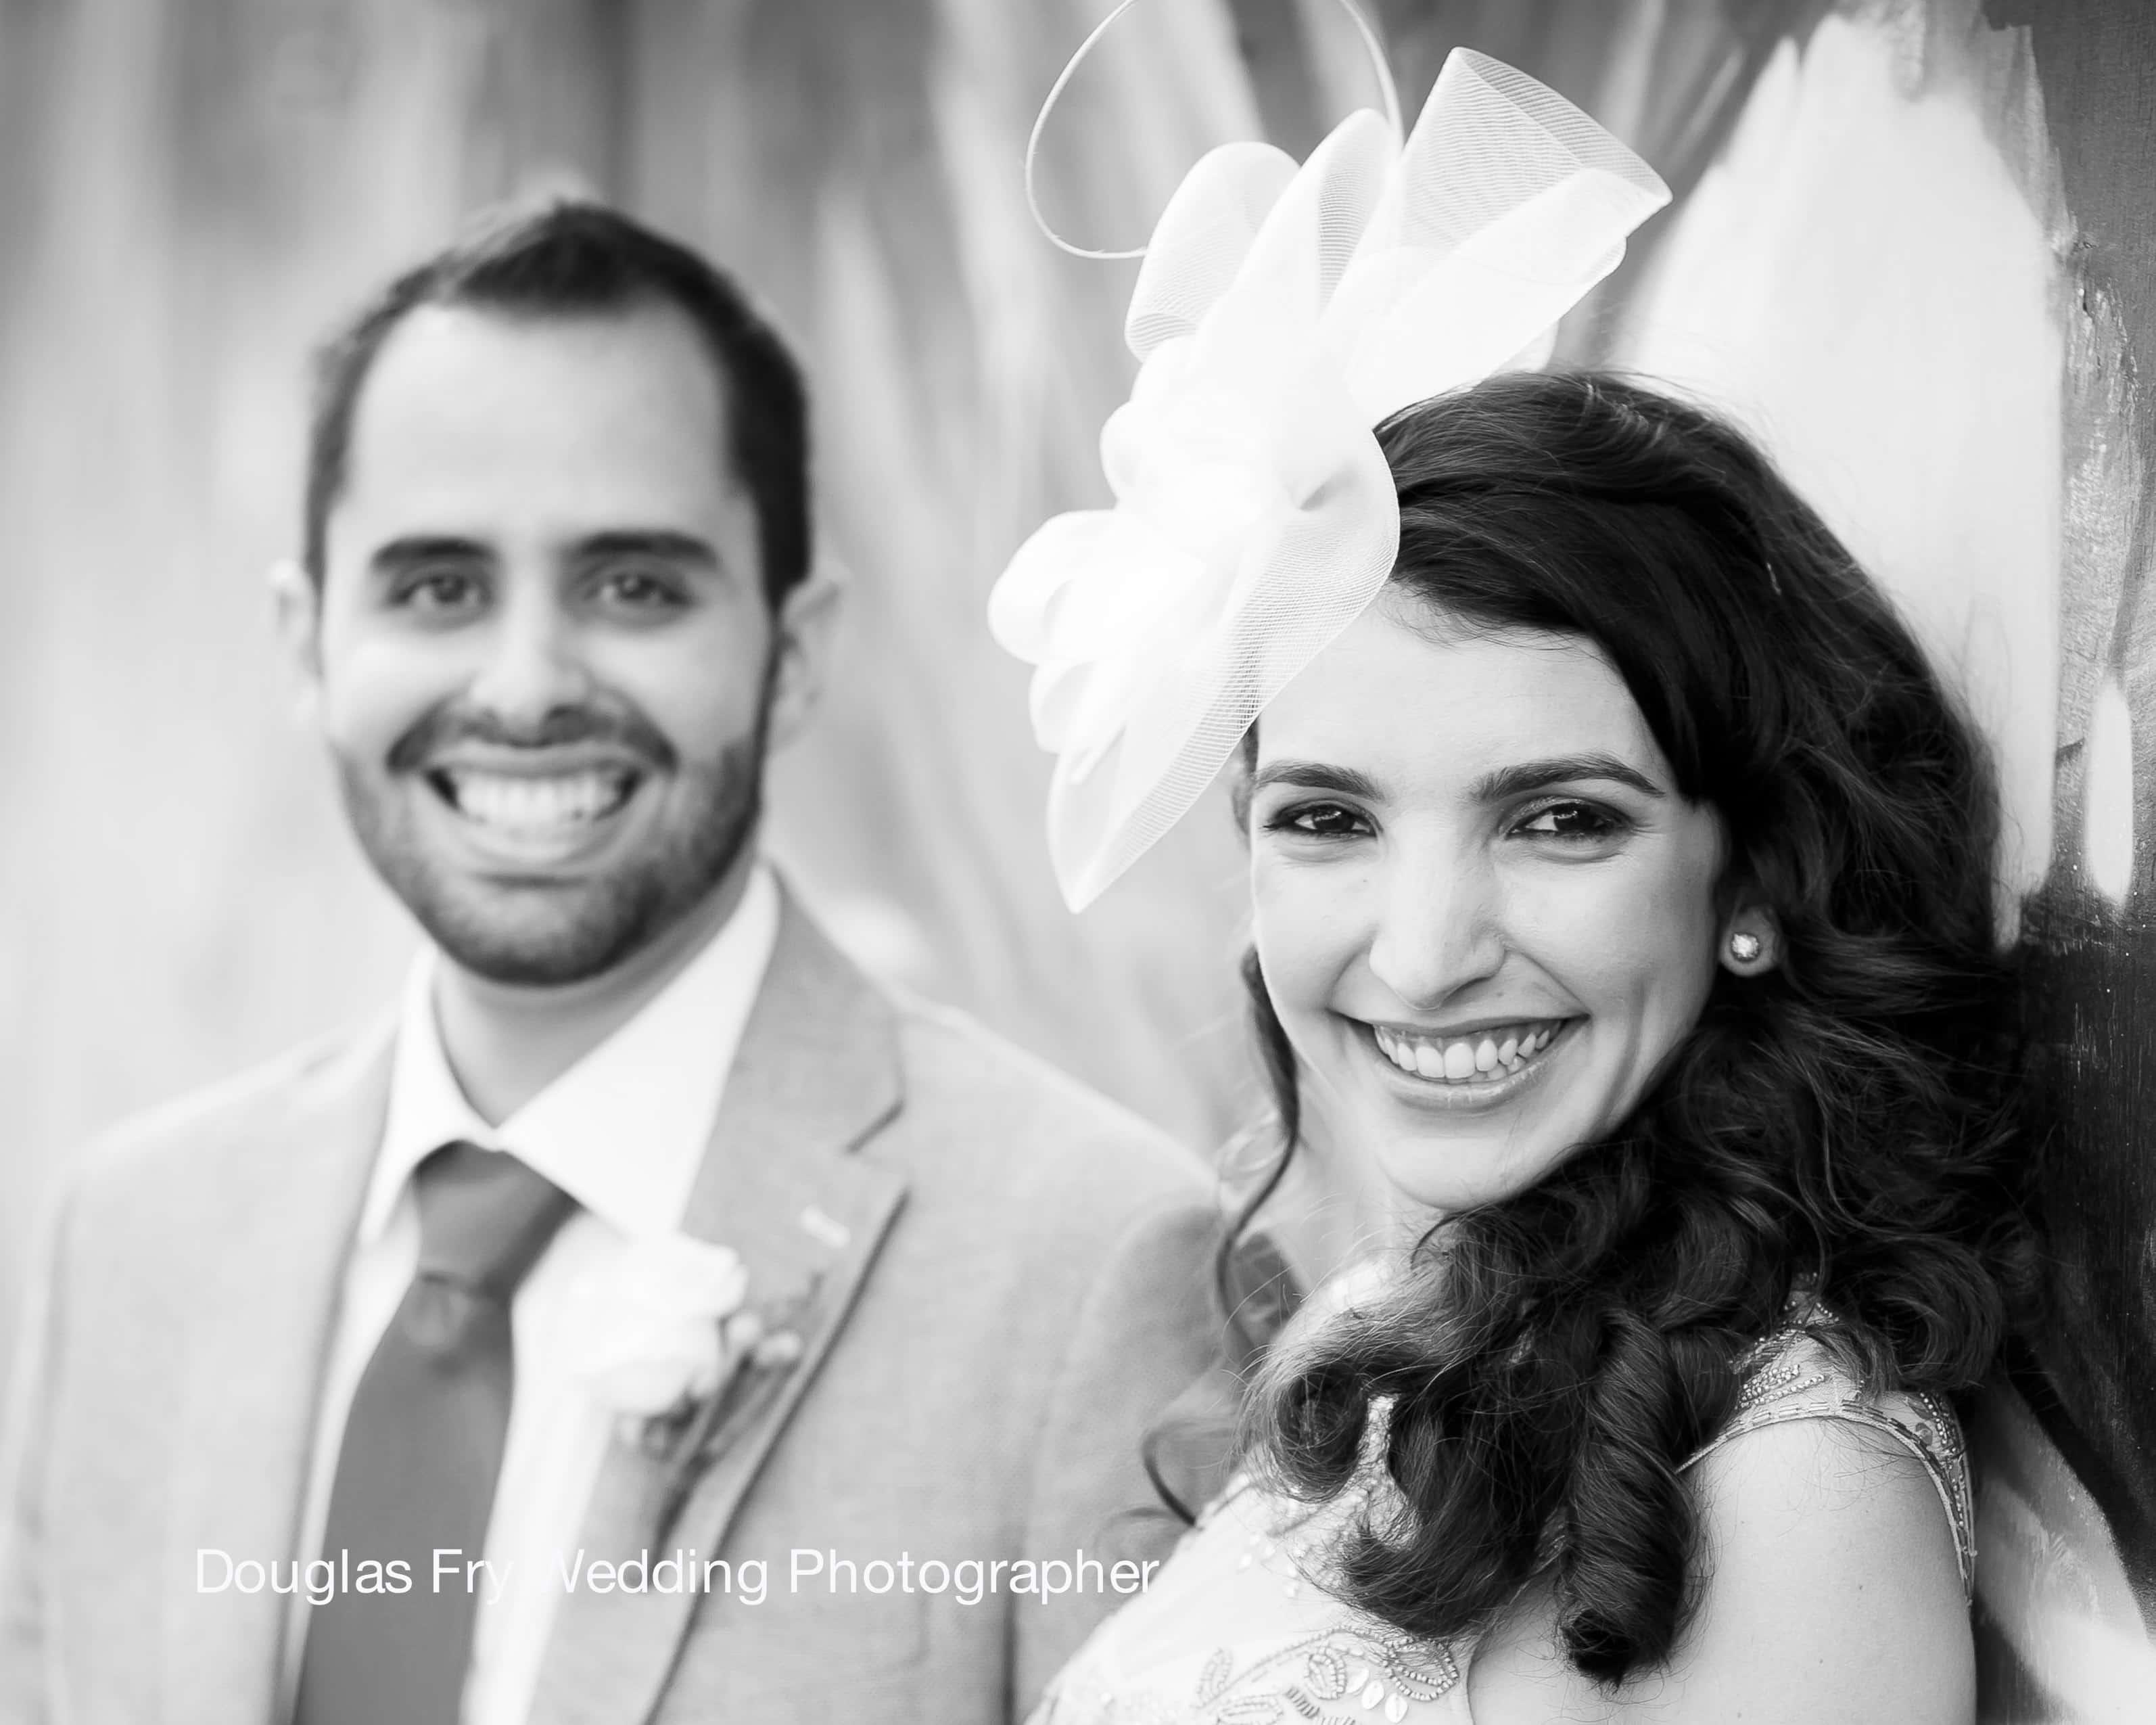 Wedding Photograph Veronica in Shoreditch